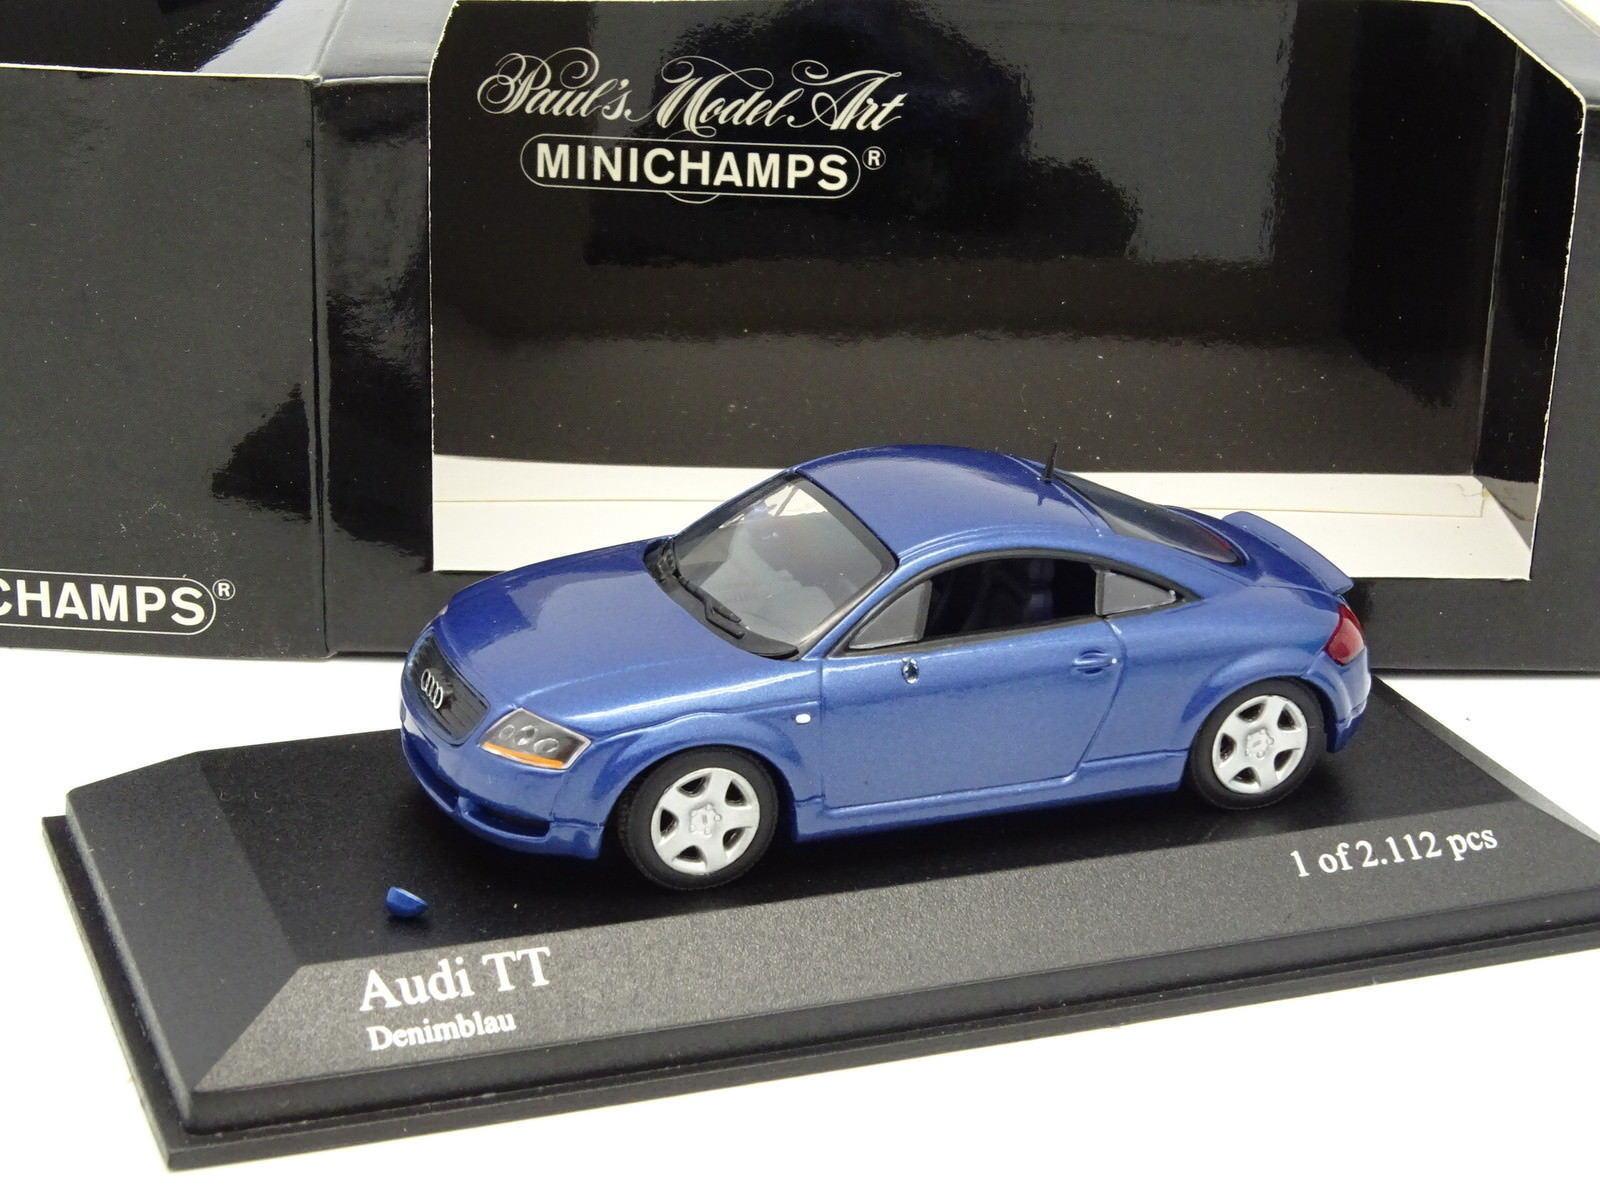 Minichamps 1 43 - Audi TT Denimblue